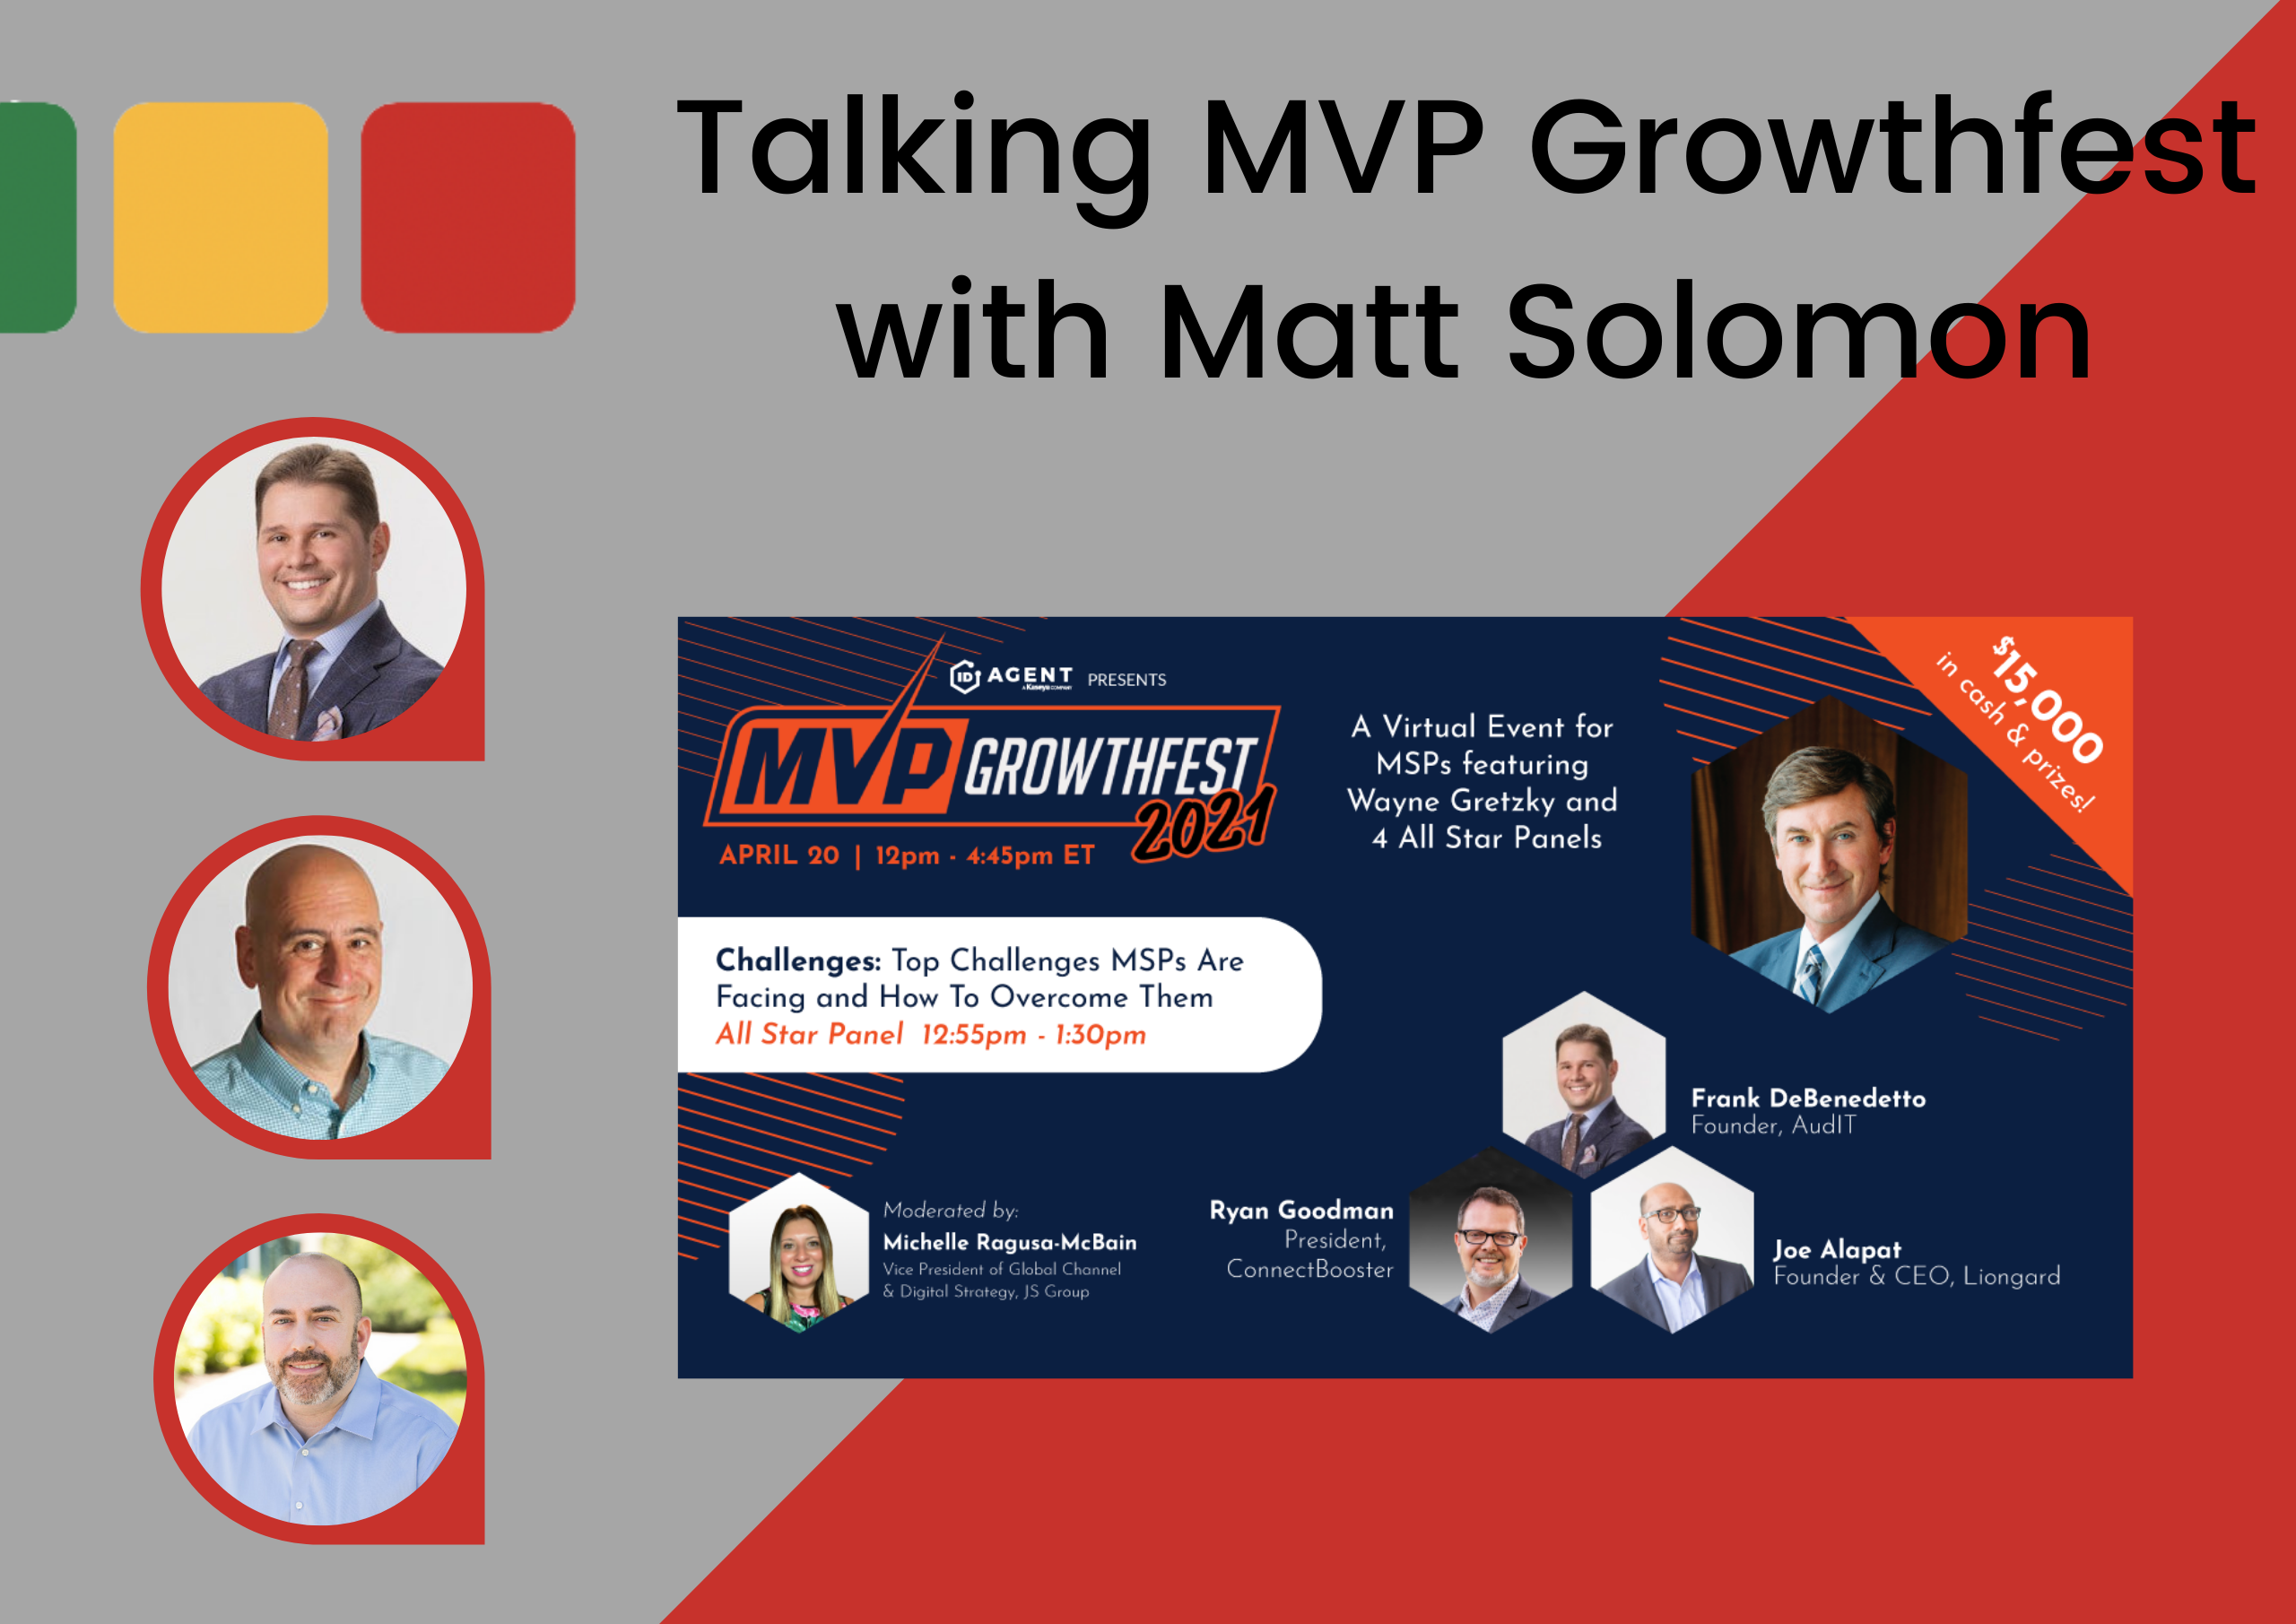 MVP-Growthfest-with-Matt-Solomon-2560x1811-1